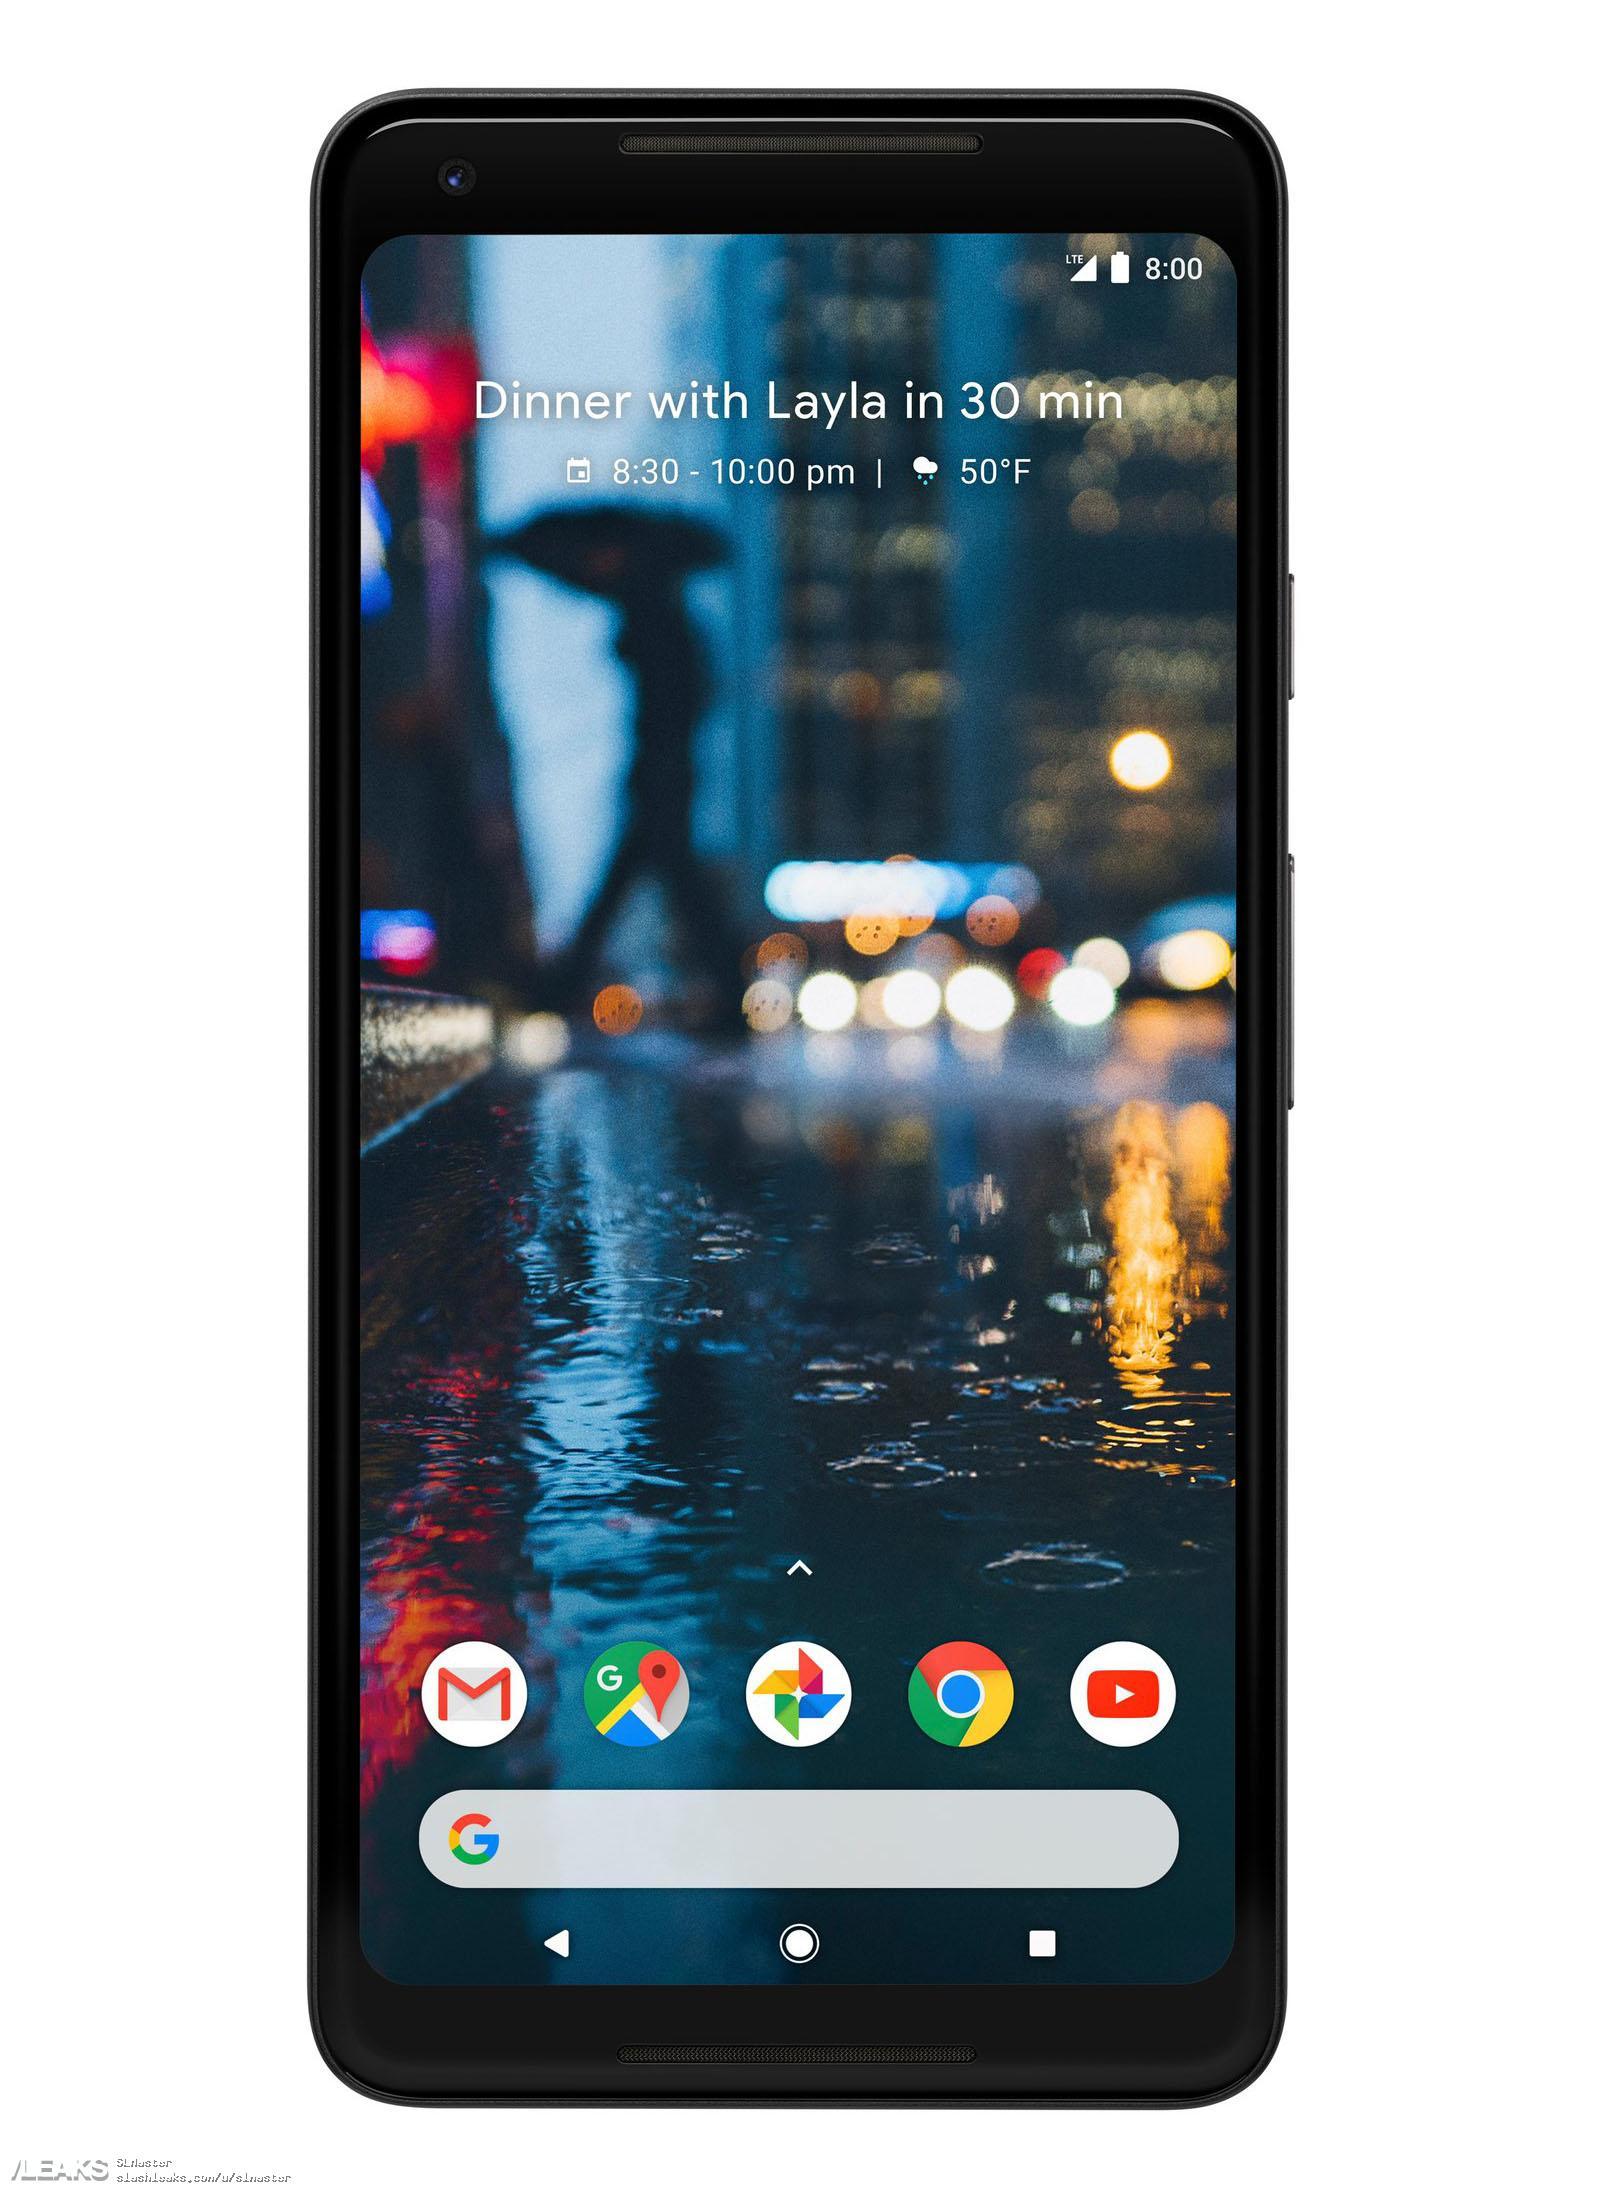 img Google Pixel 2 XL leaked by Evan Blass [UPDATED]